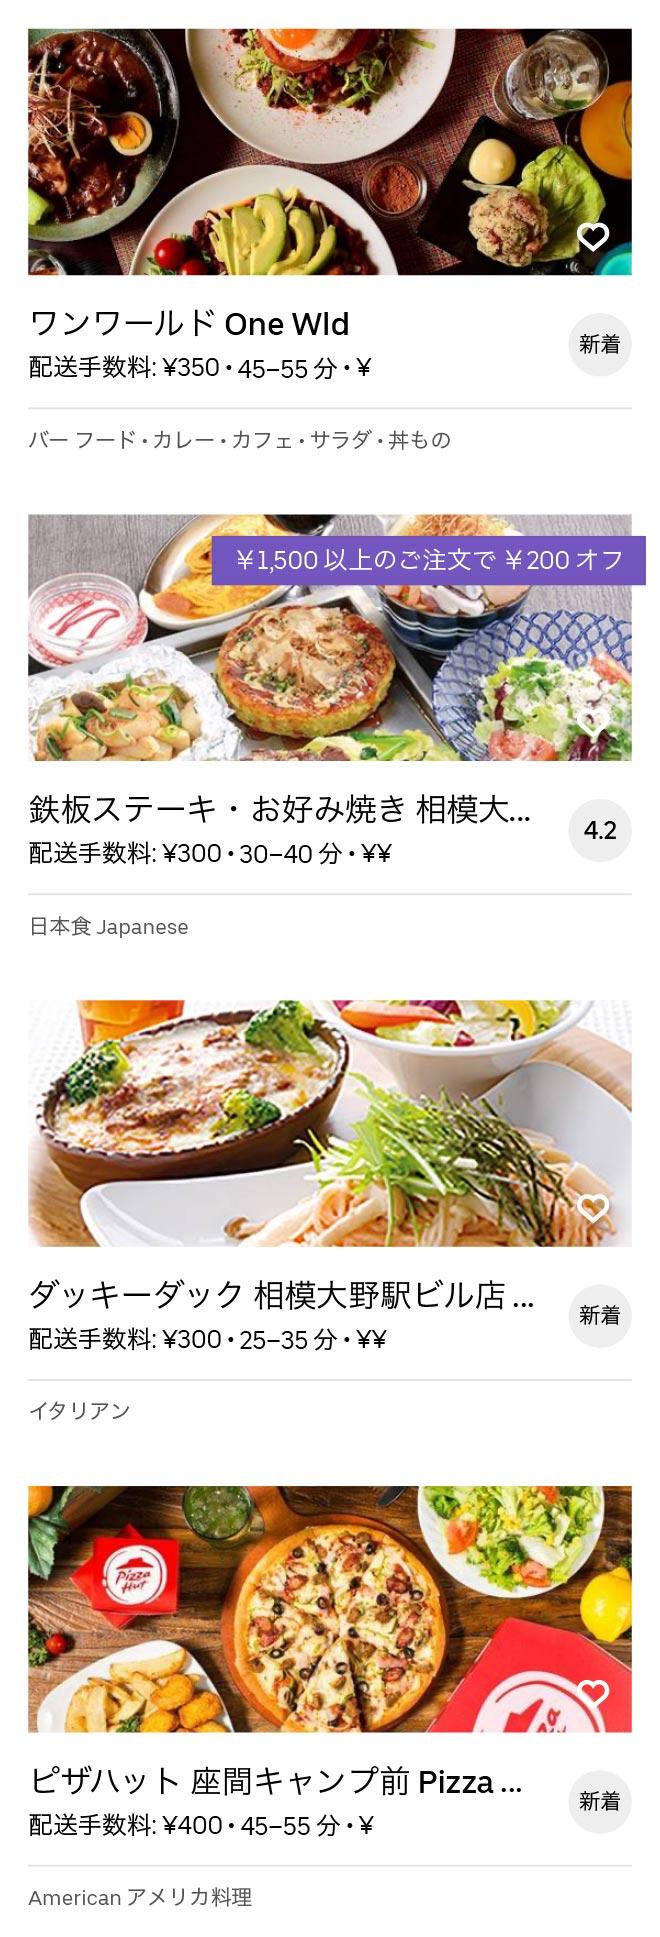 Chuo rinkan menu 2008 12